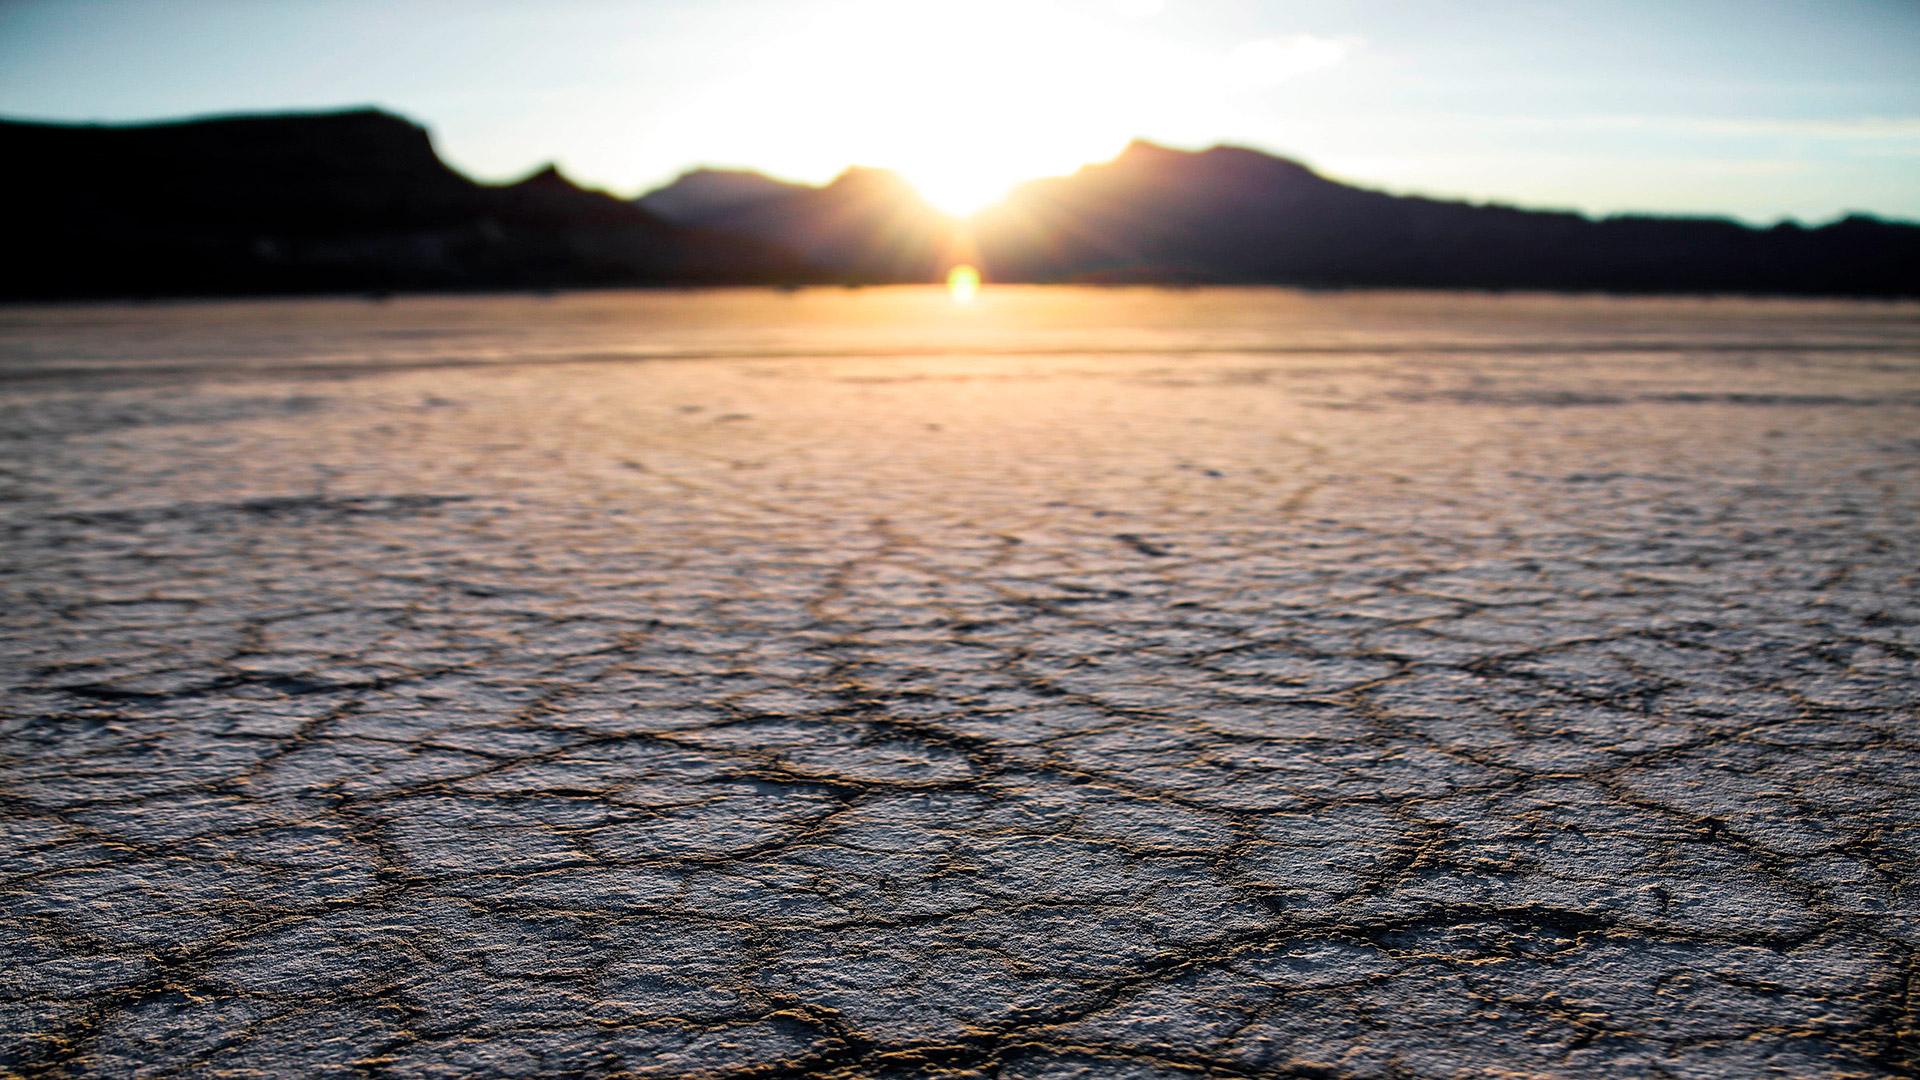 ¿Comunicar, concienciar o pasar a la acción contra el cambio climático?